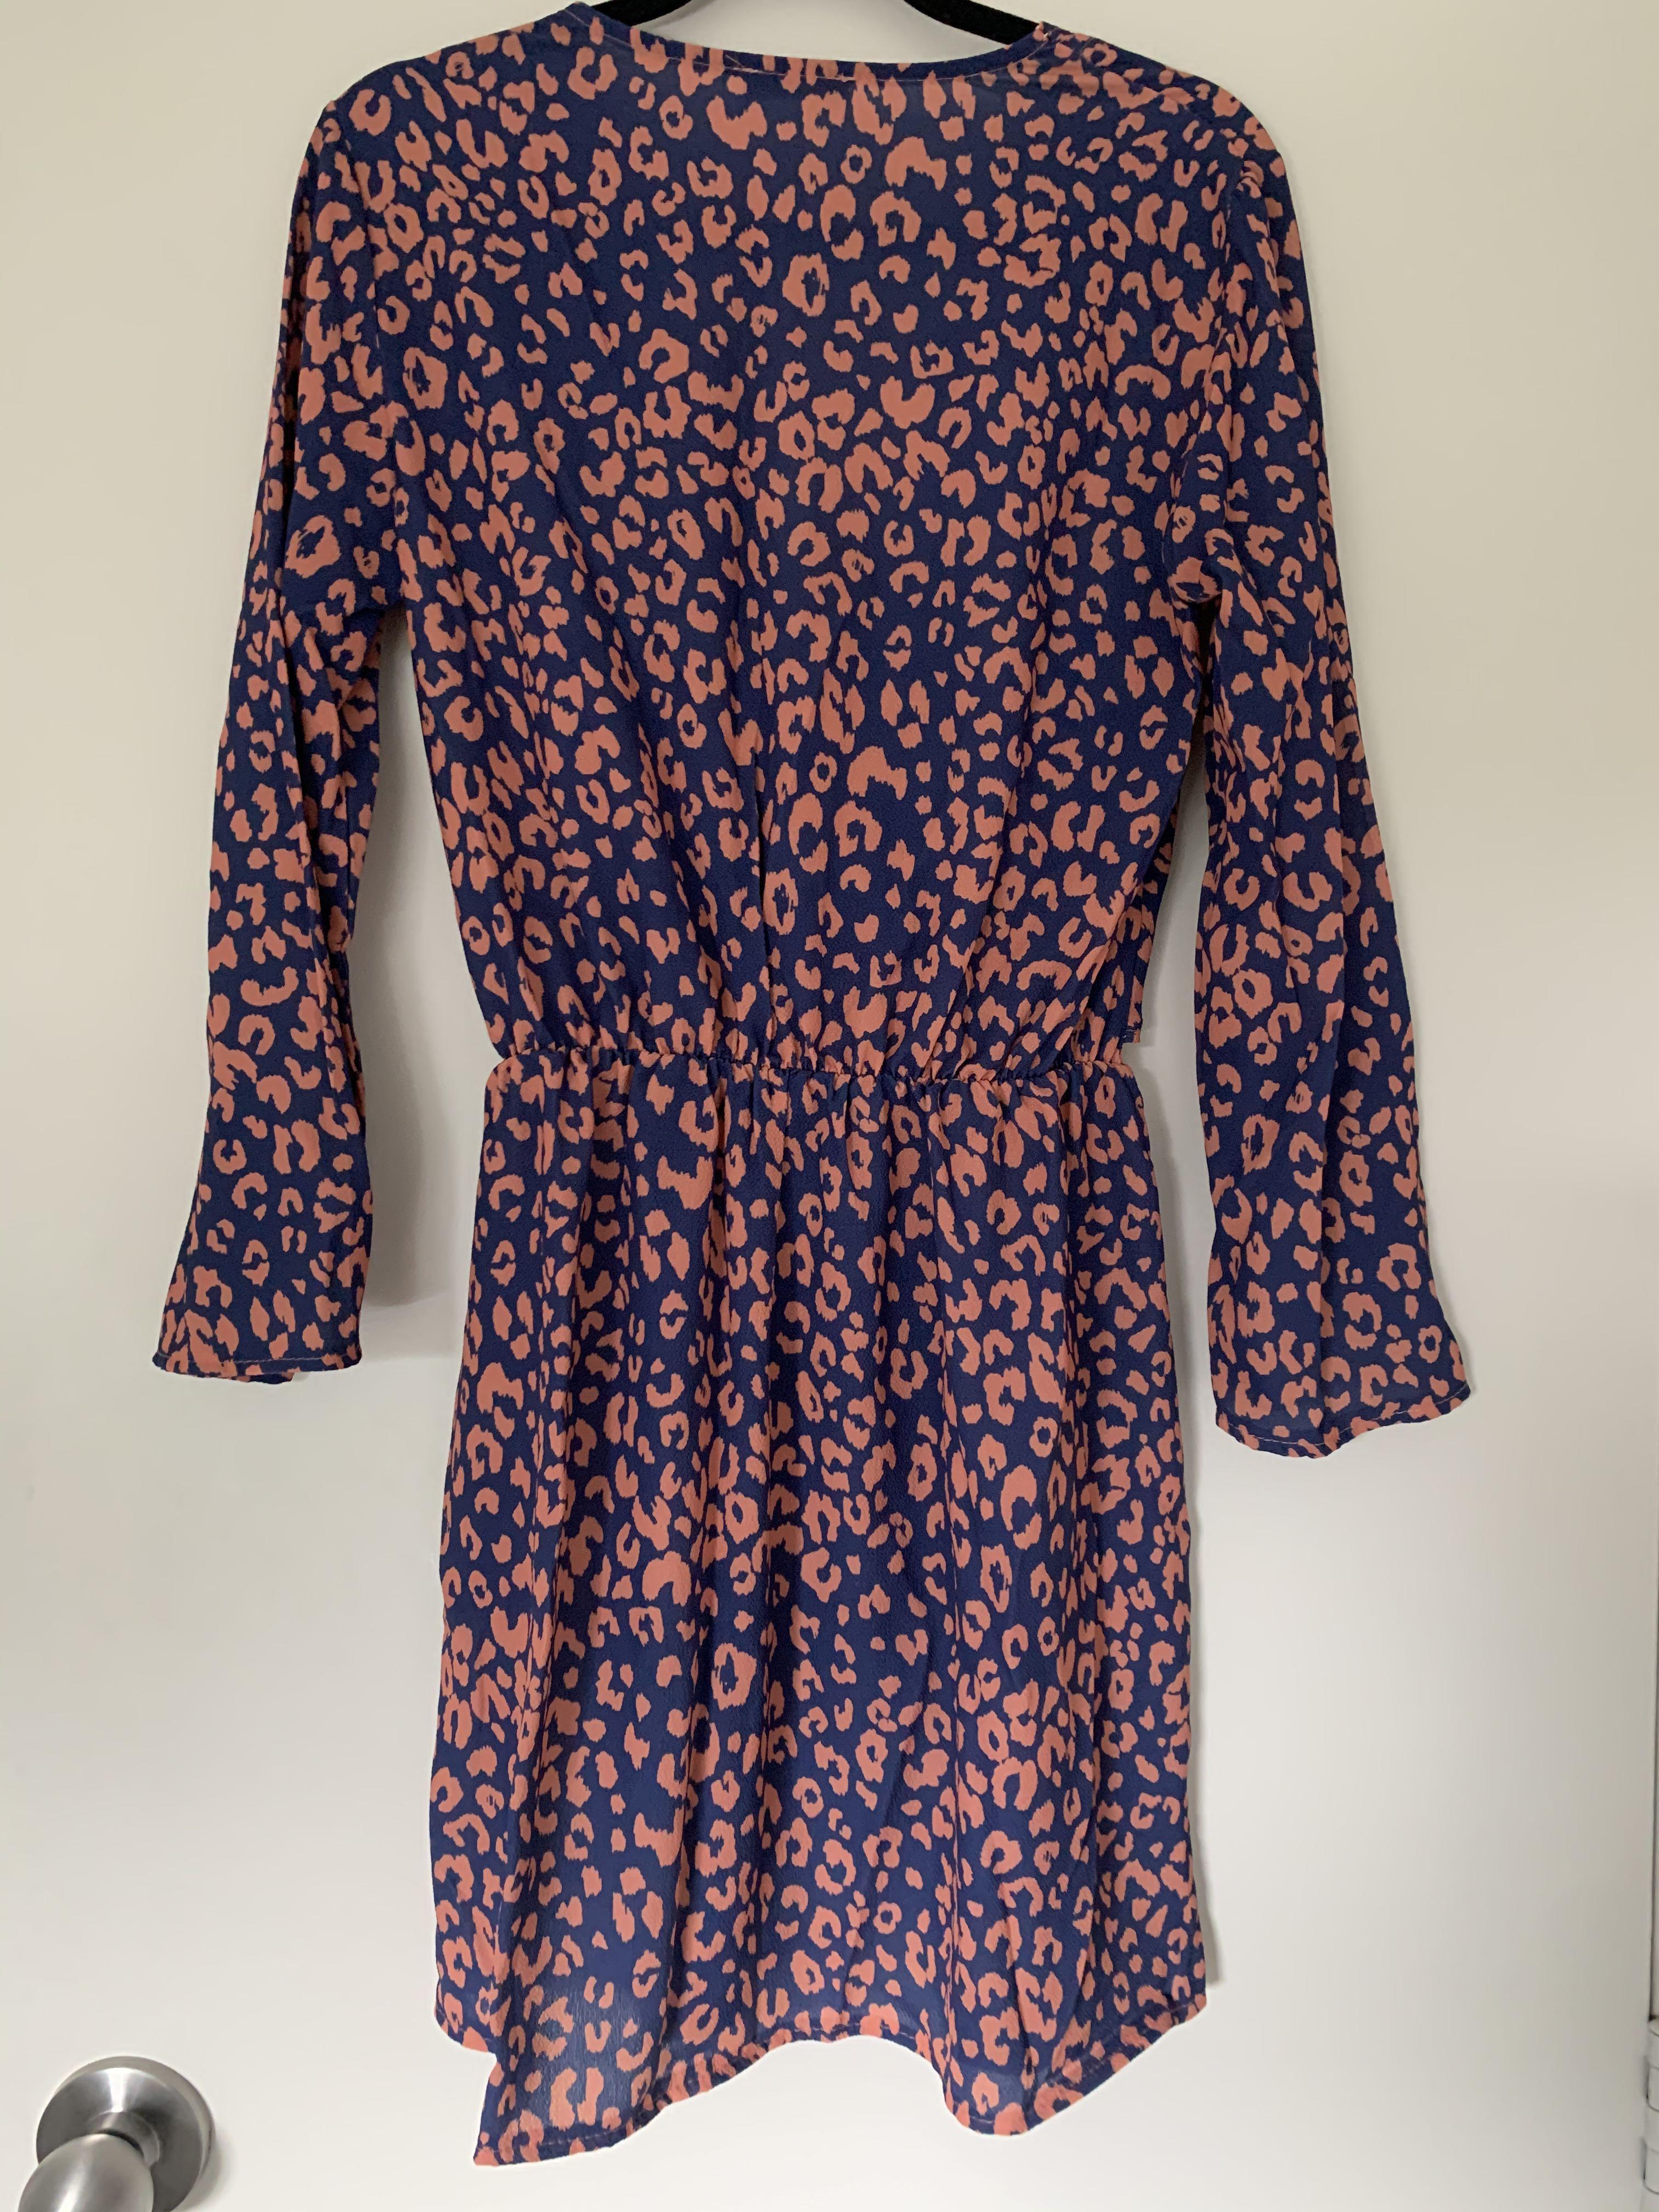 Boohoo Dress - Size 10